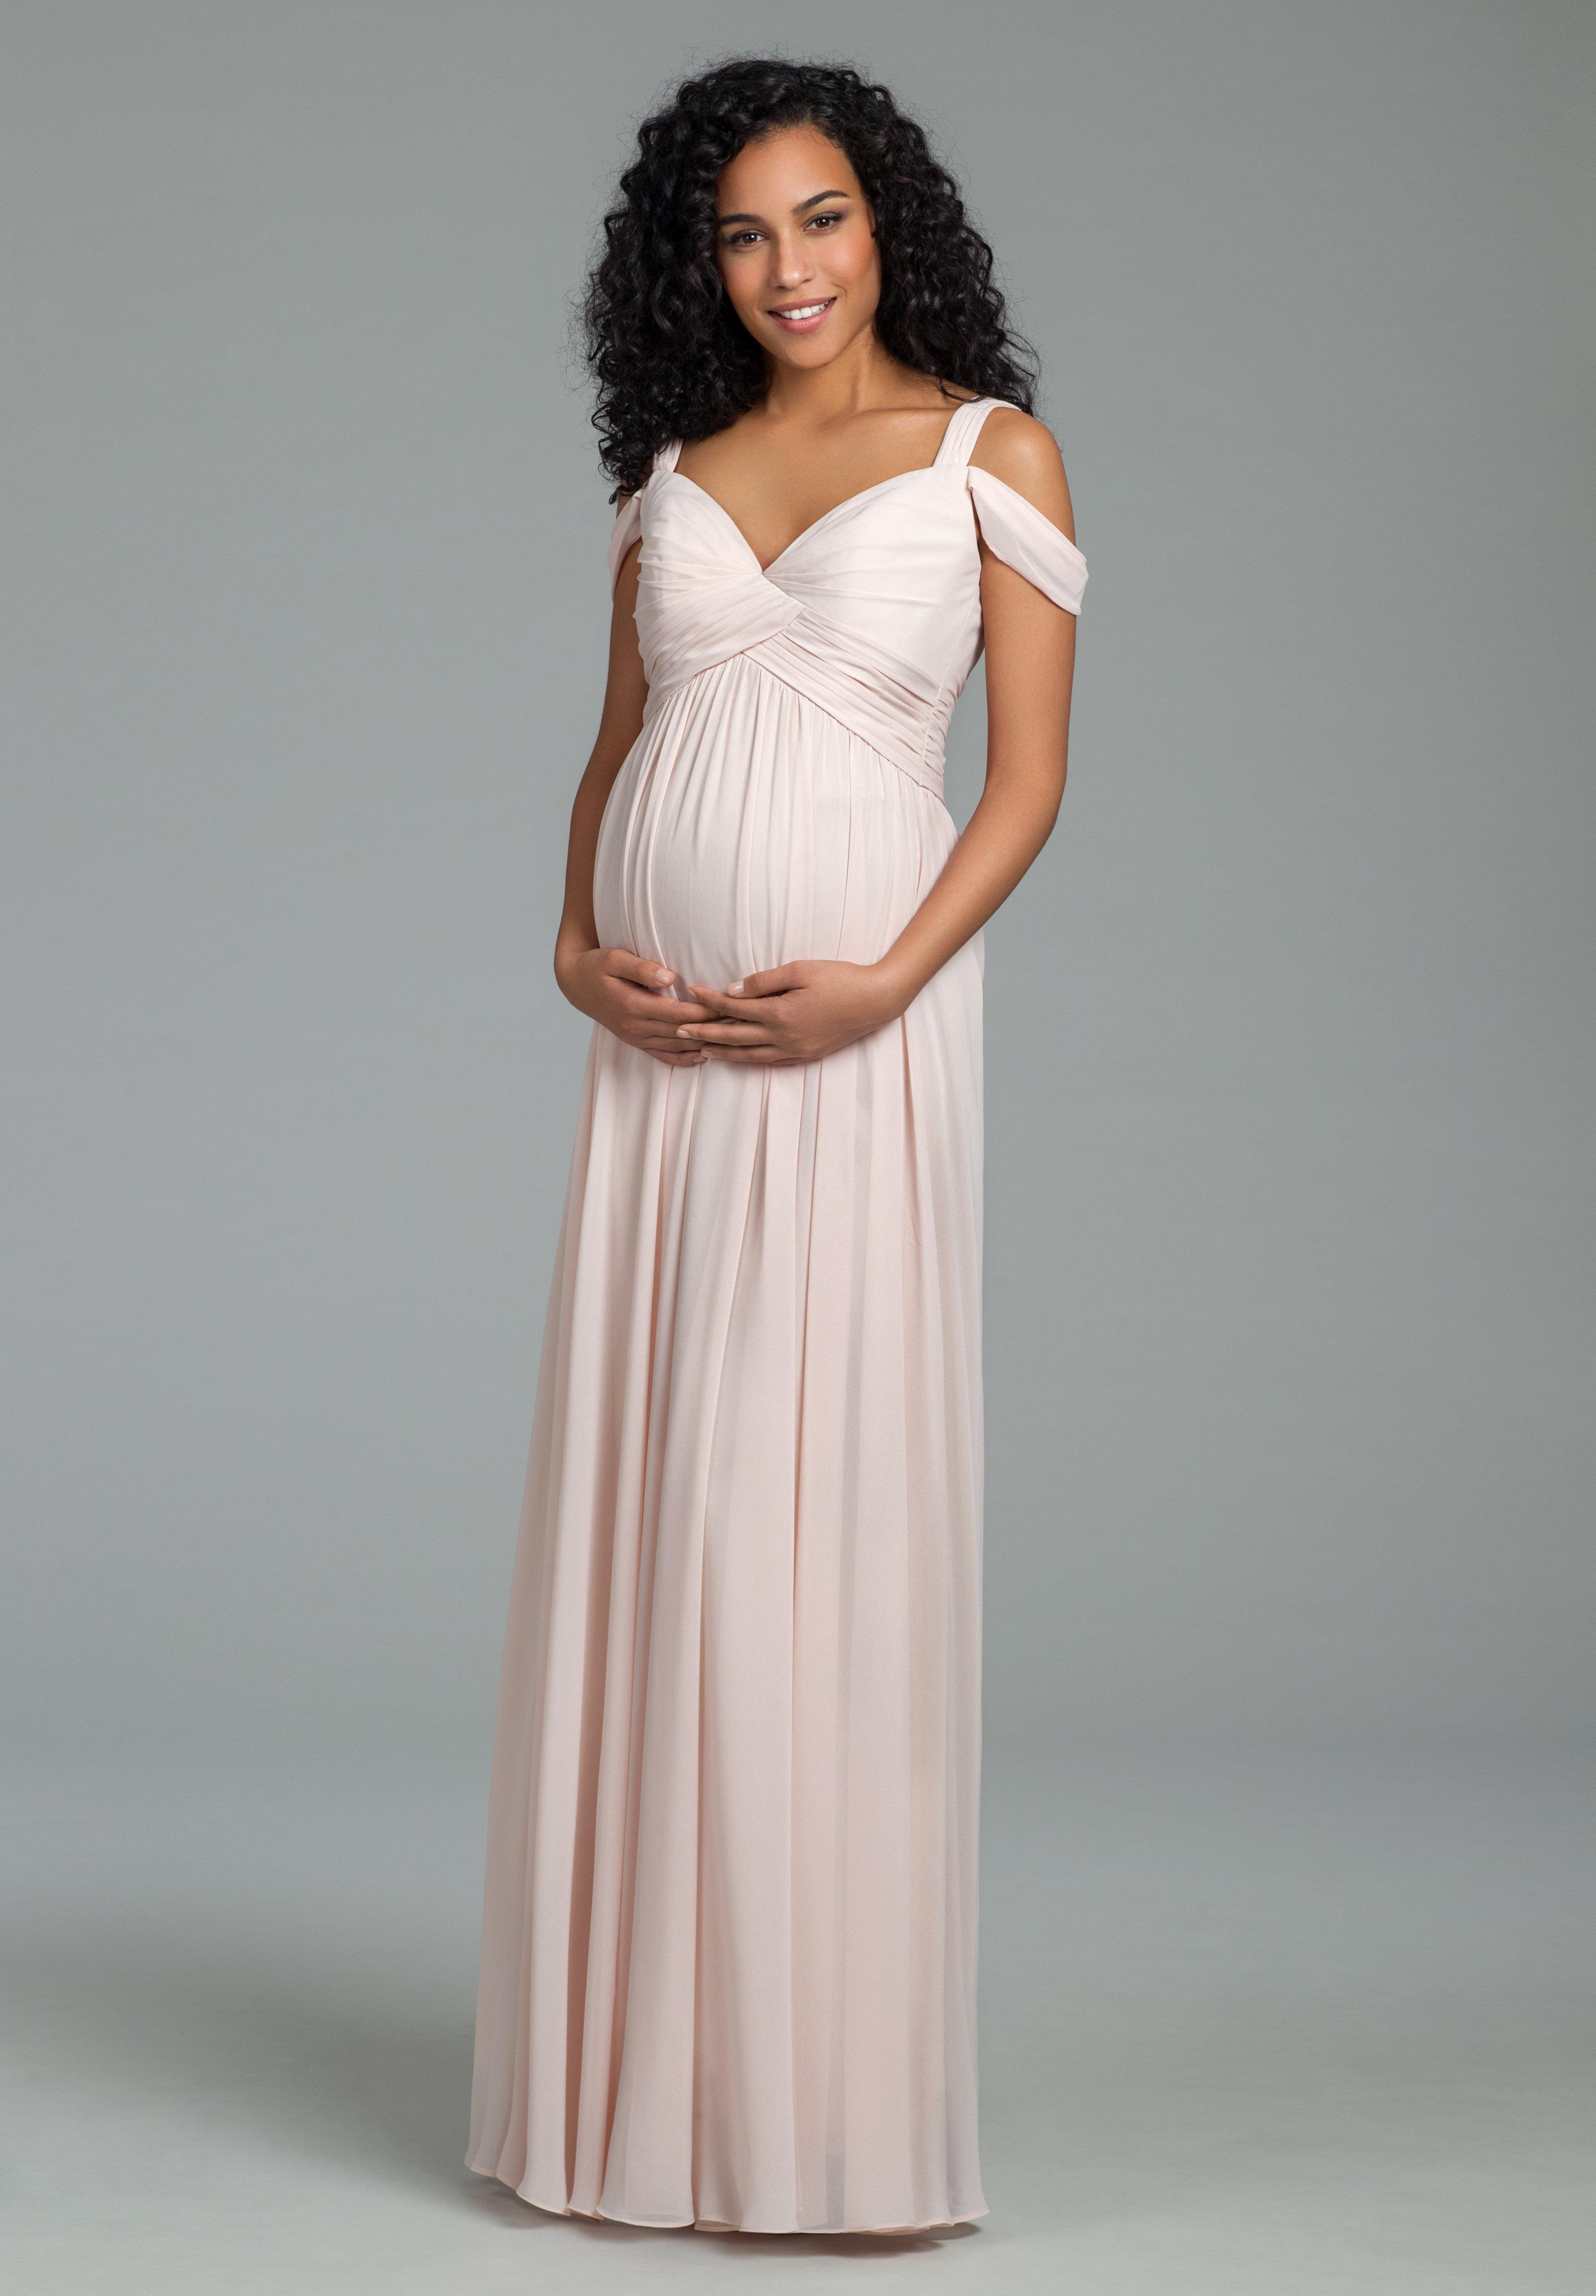 maternity bridesmaid dresses canada